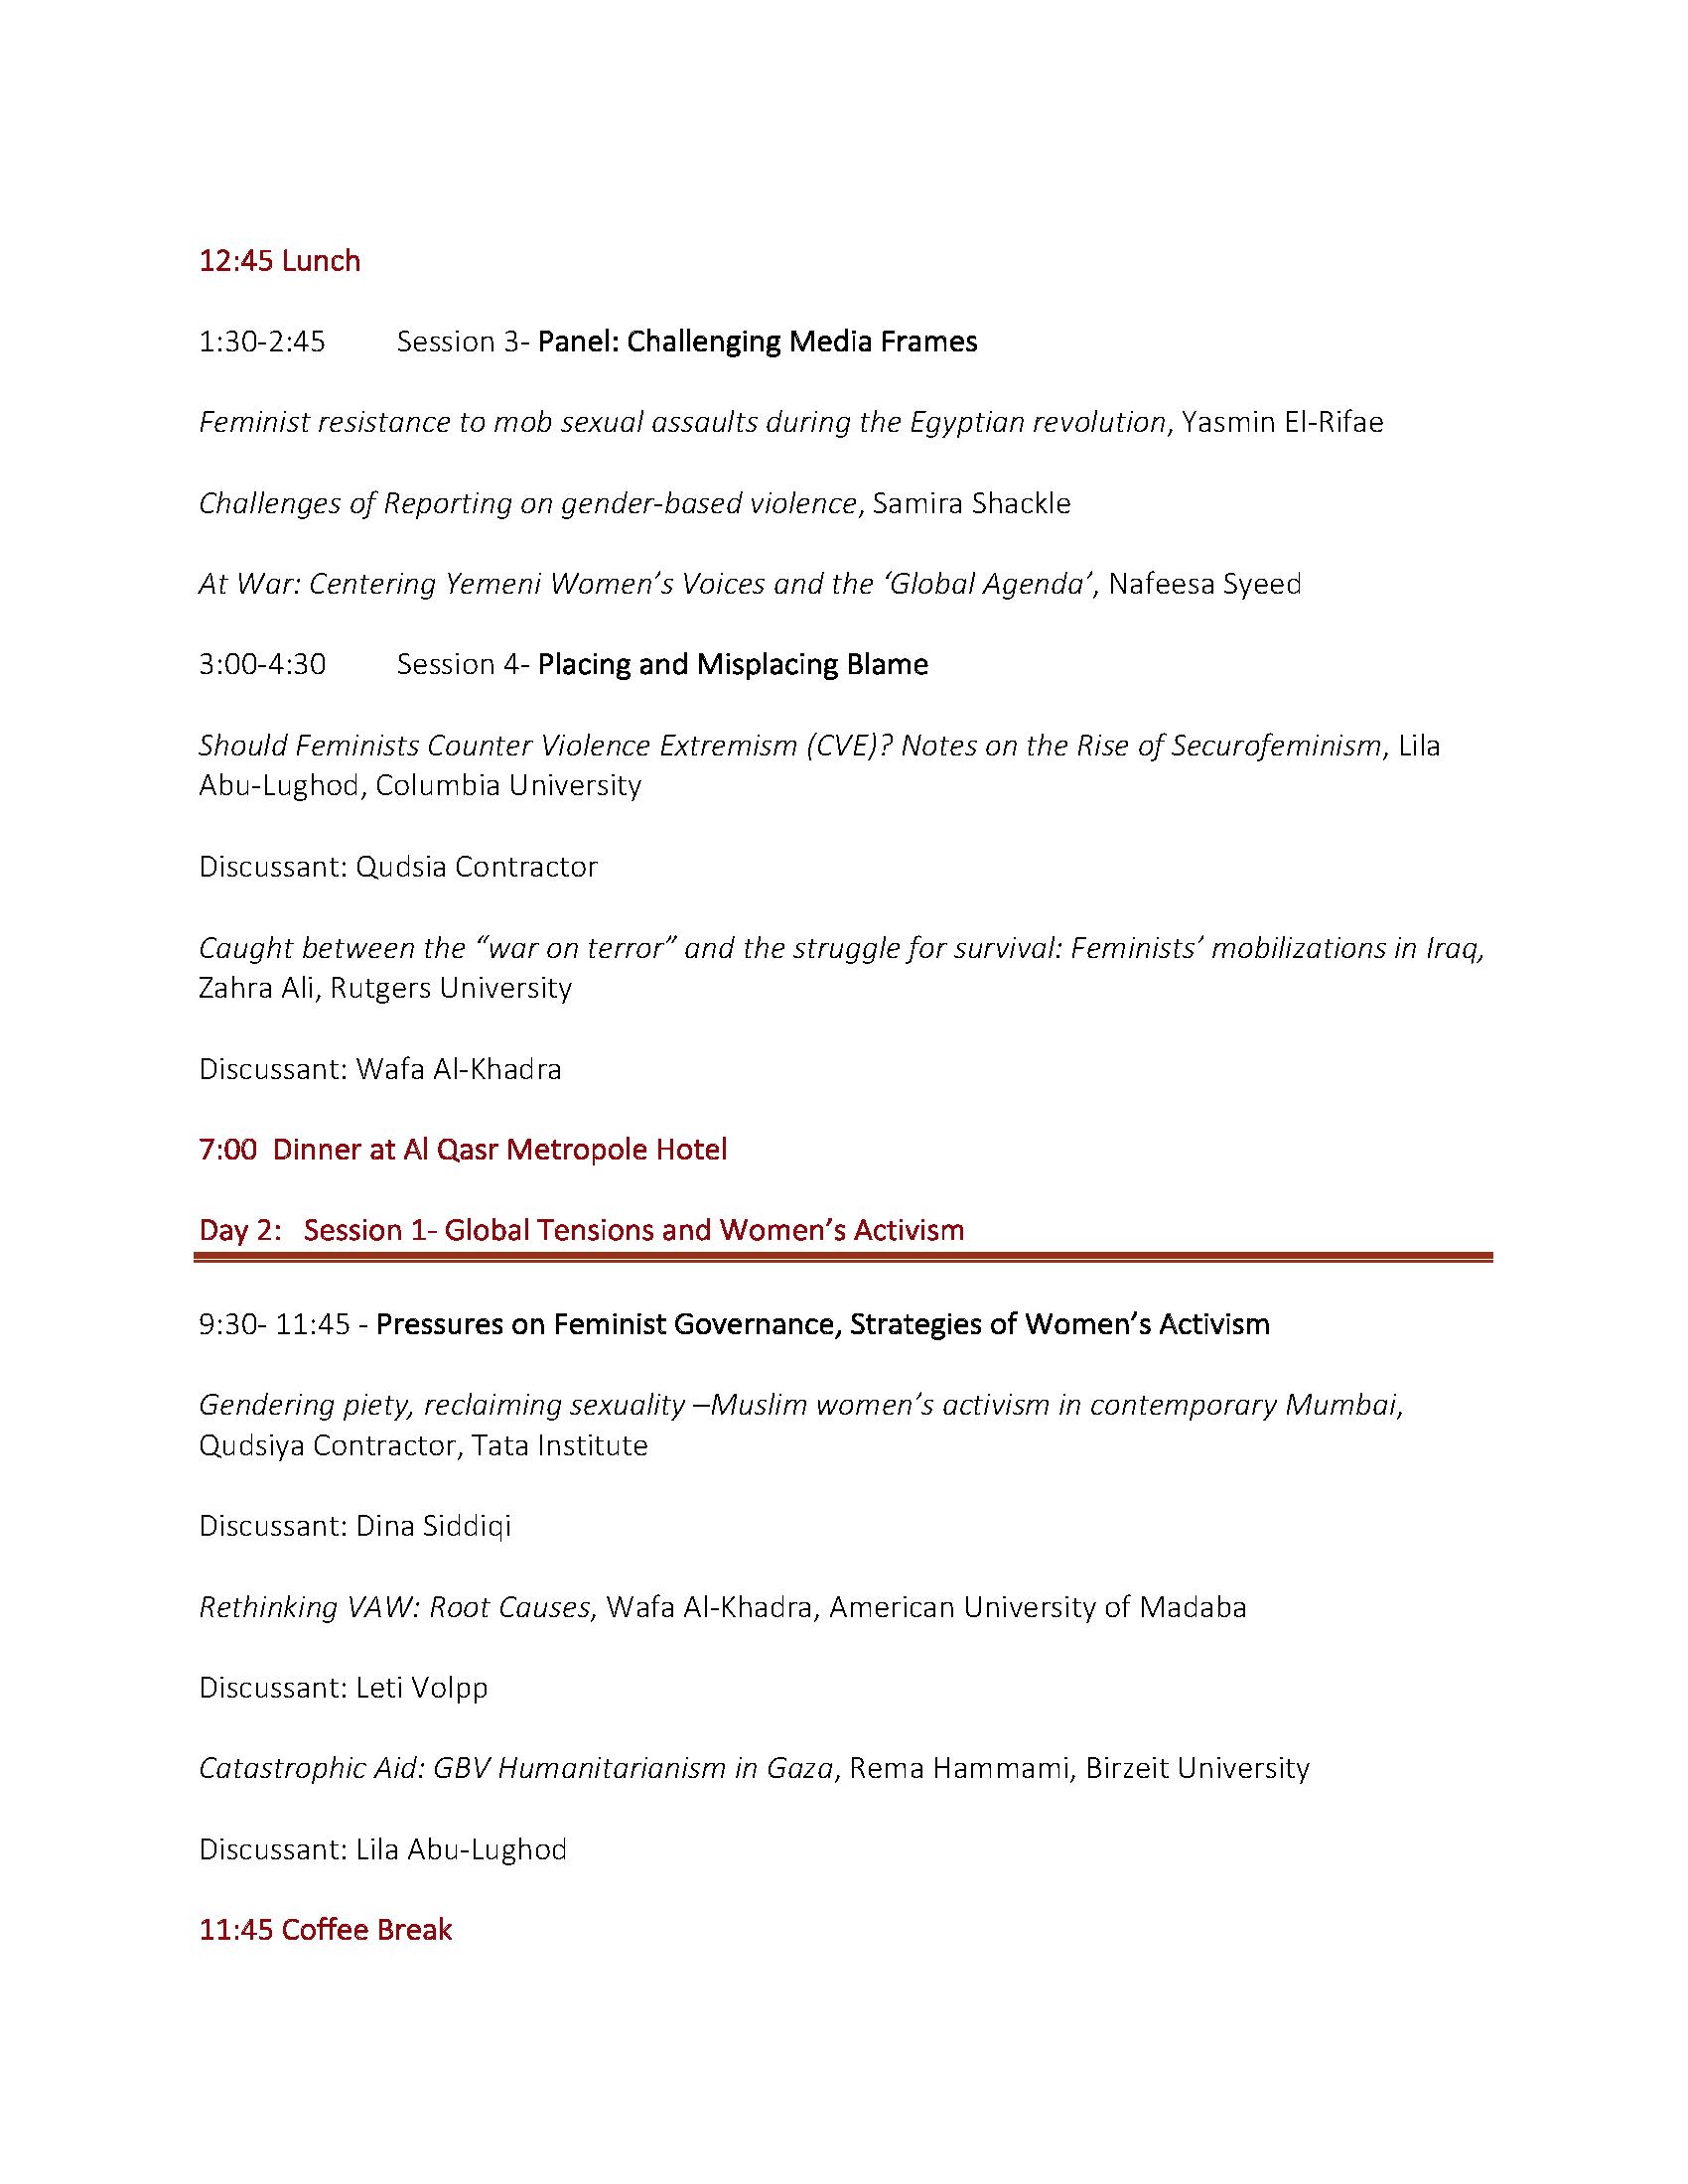 AmmanProgram_Sept2017_Page_2.png